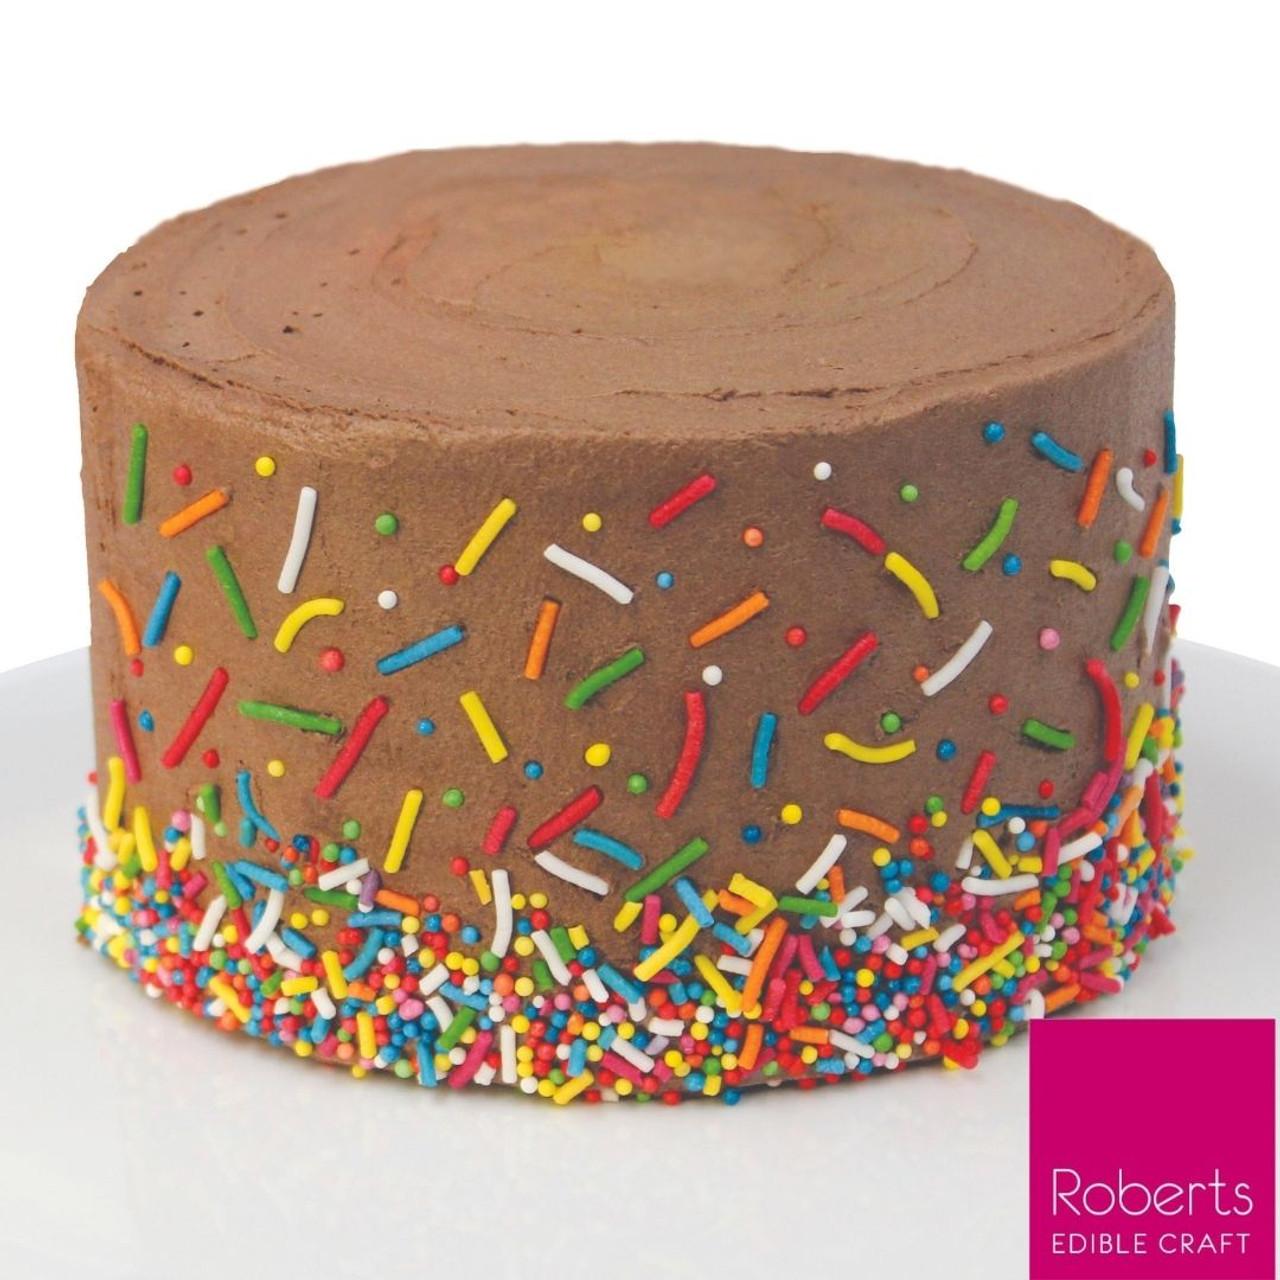 Chocolate Cake Kit - Sprinkles Included